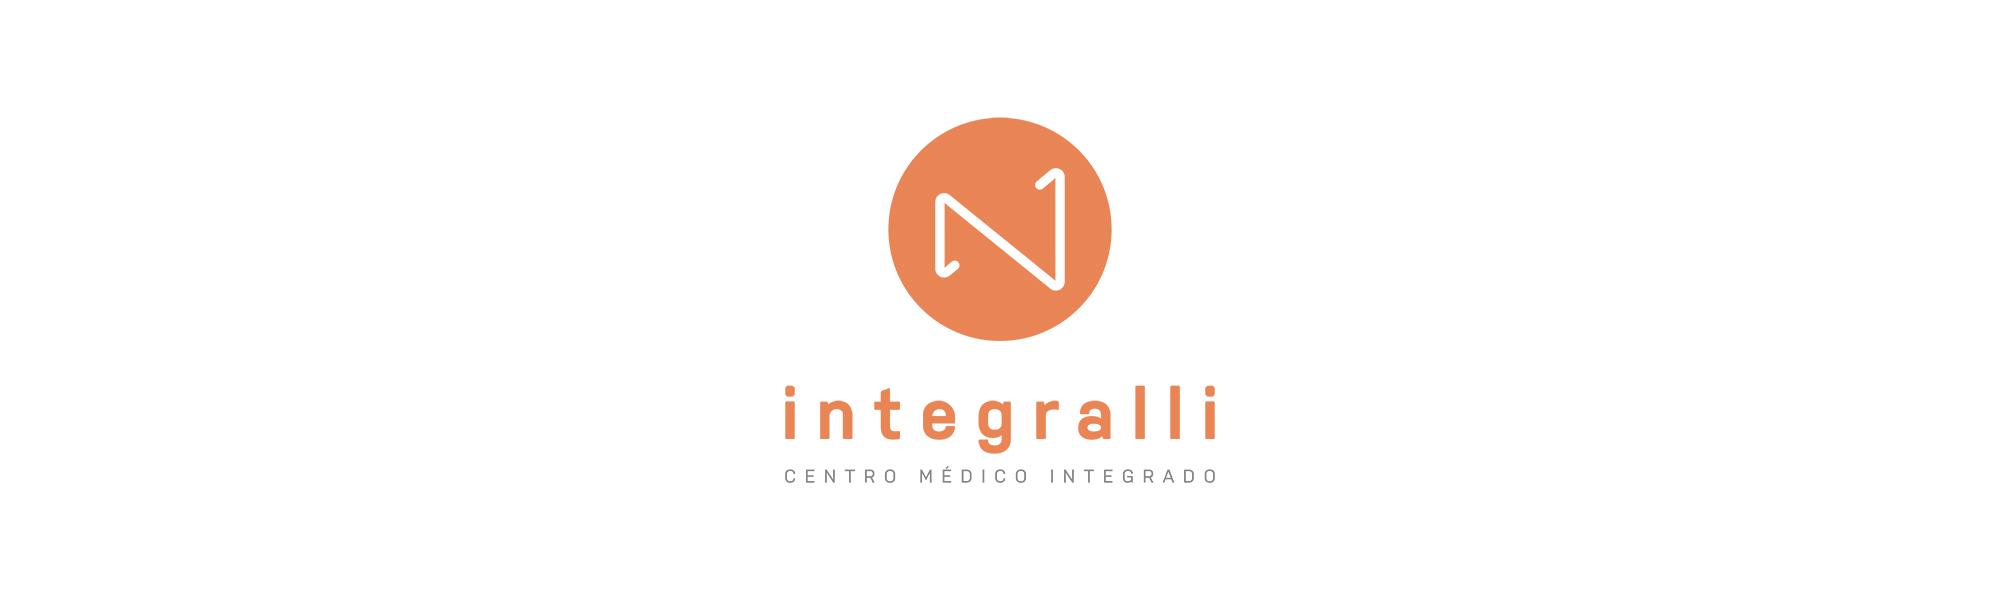 integralli-1